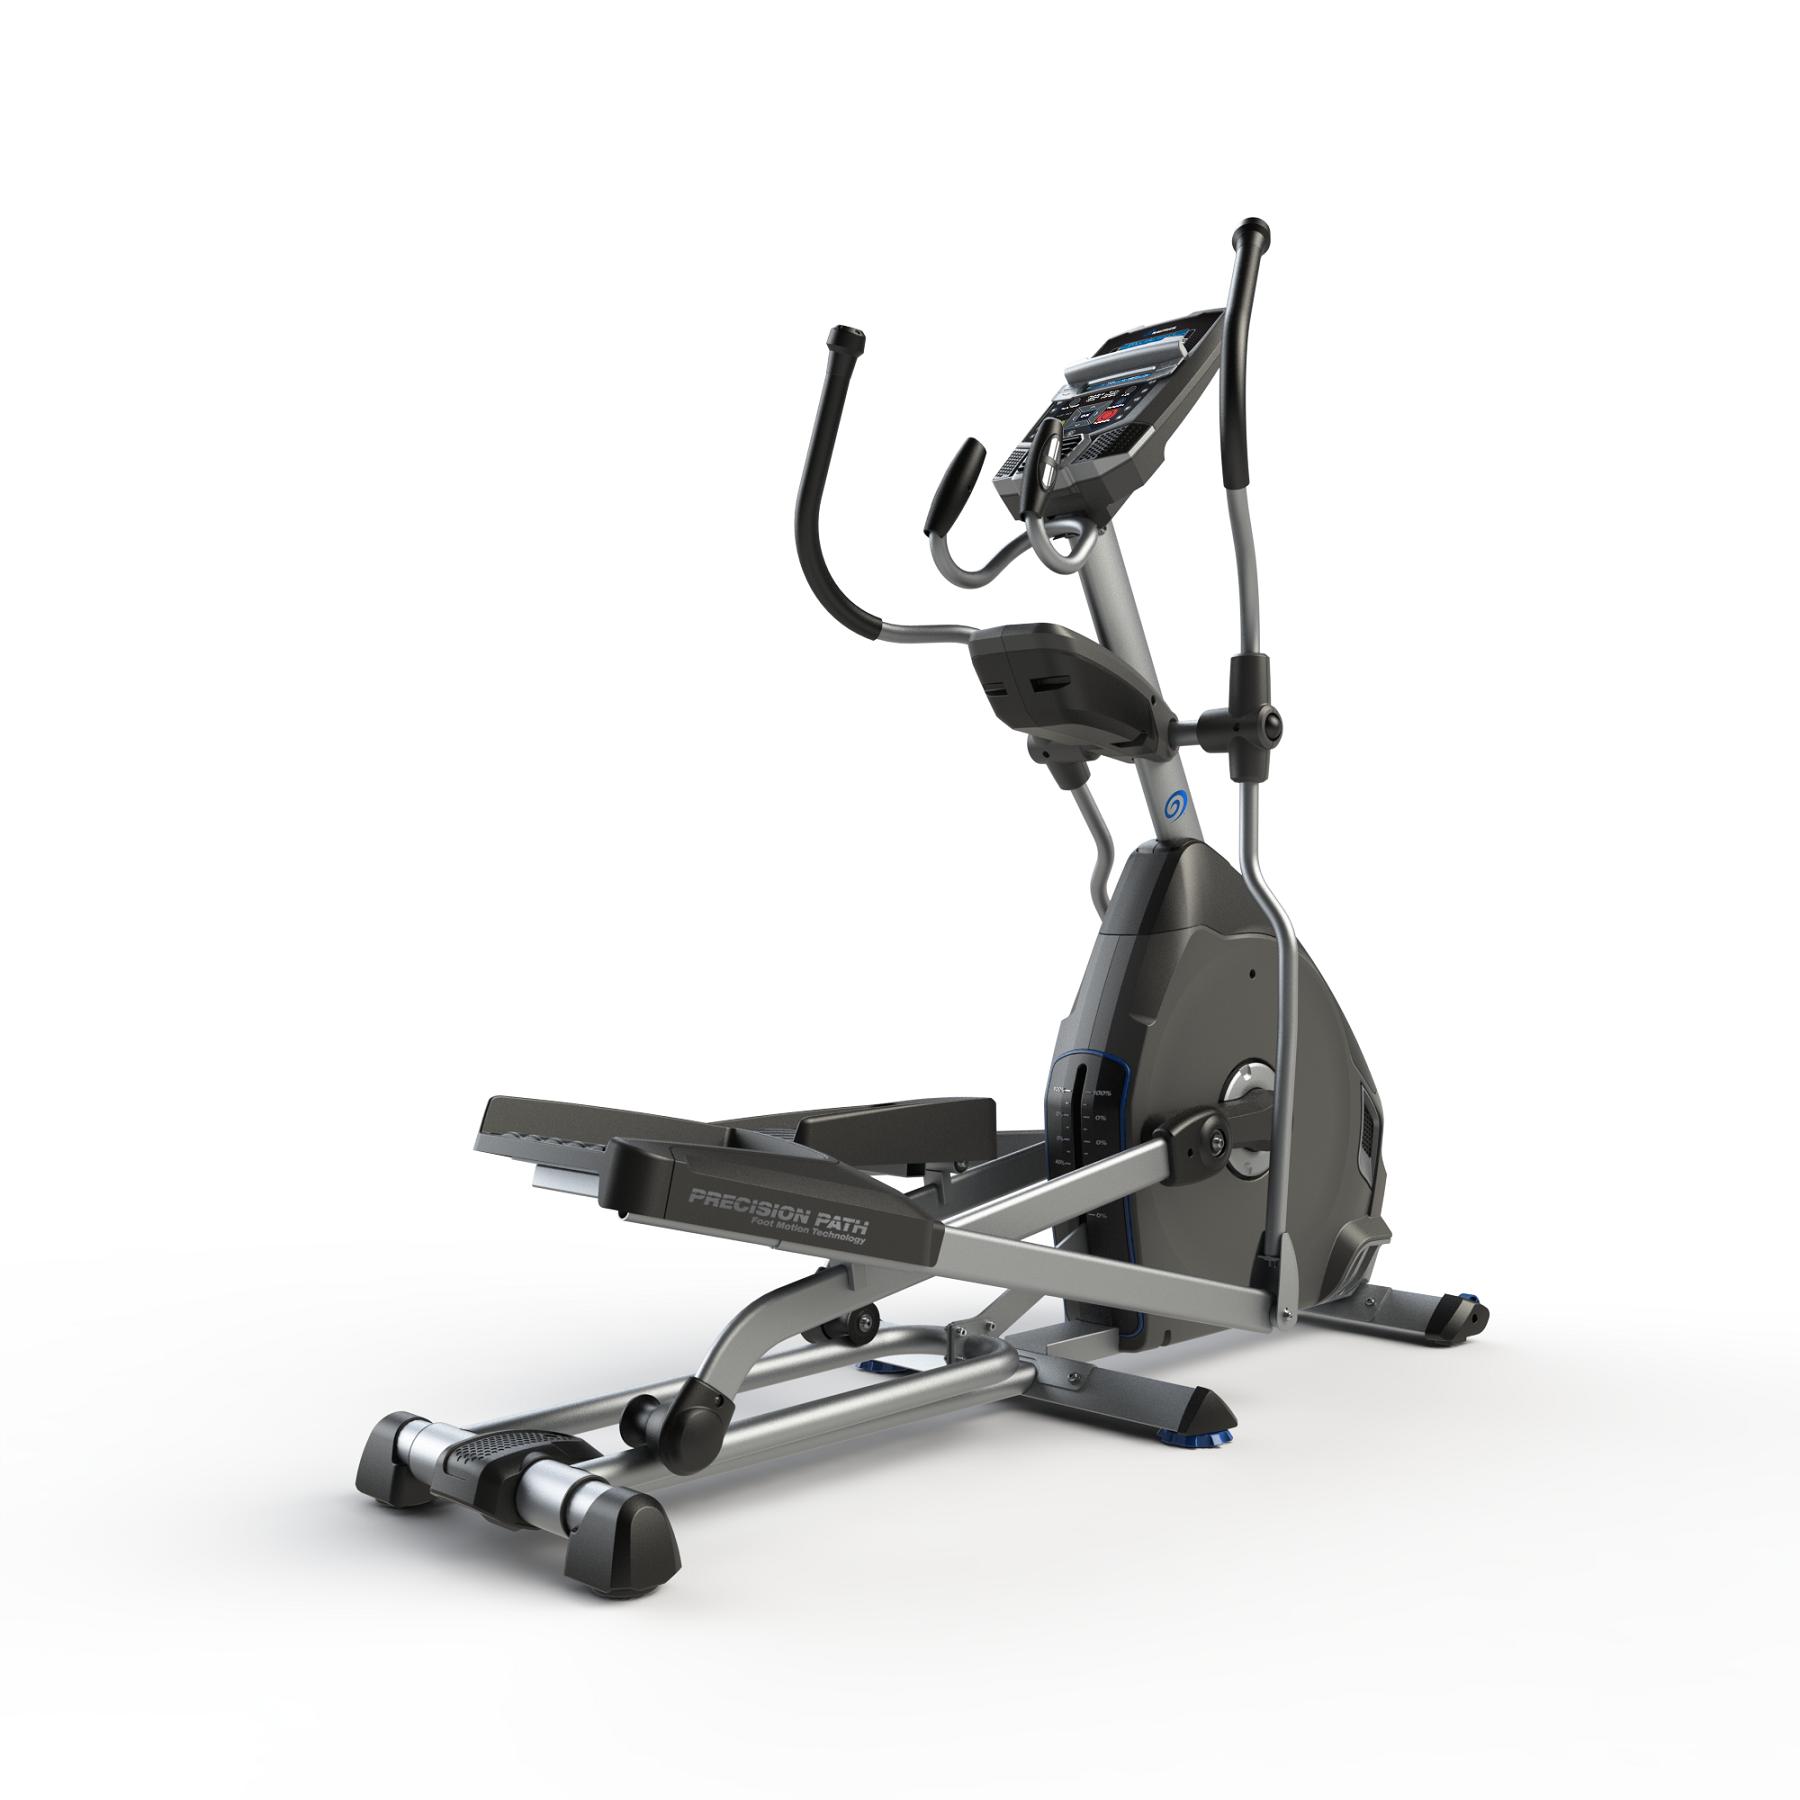 b2d30335f33 Ελλειπτικό Nautilus® E626 – Nautilus USA   Όργανα Γυμναστικής